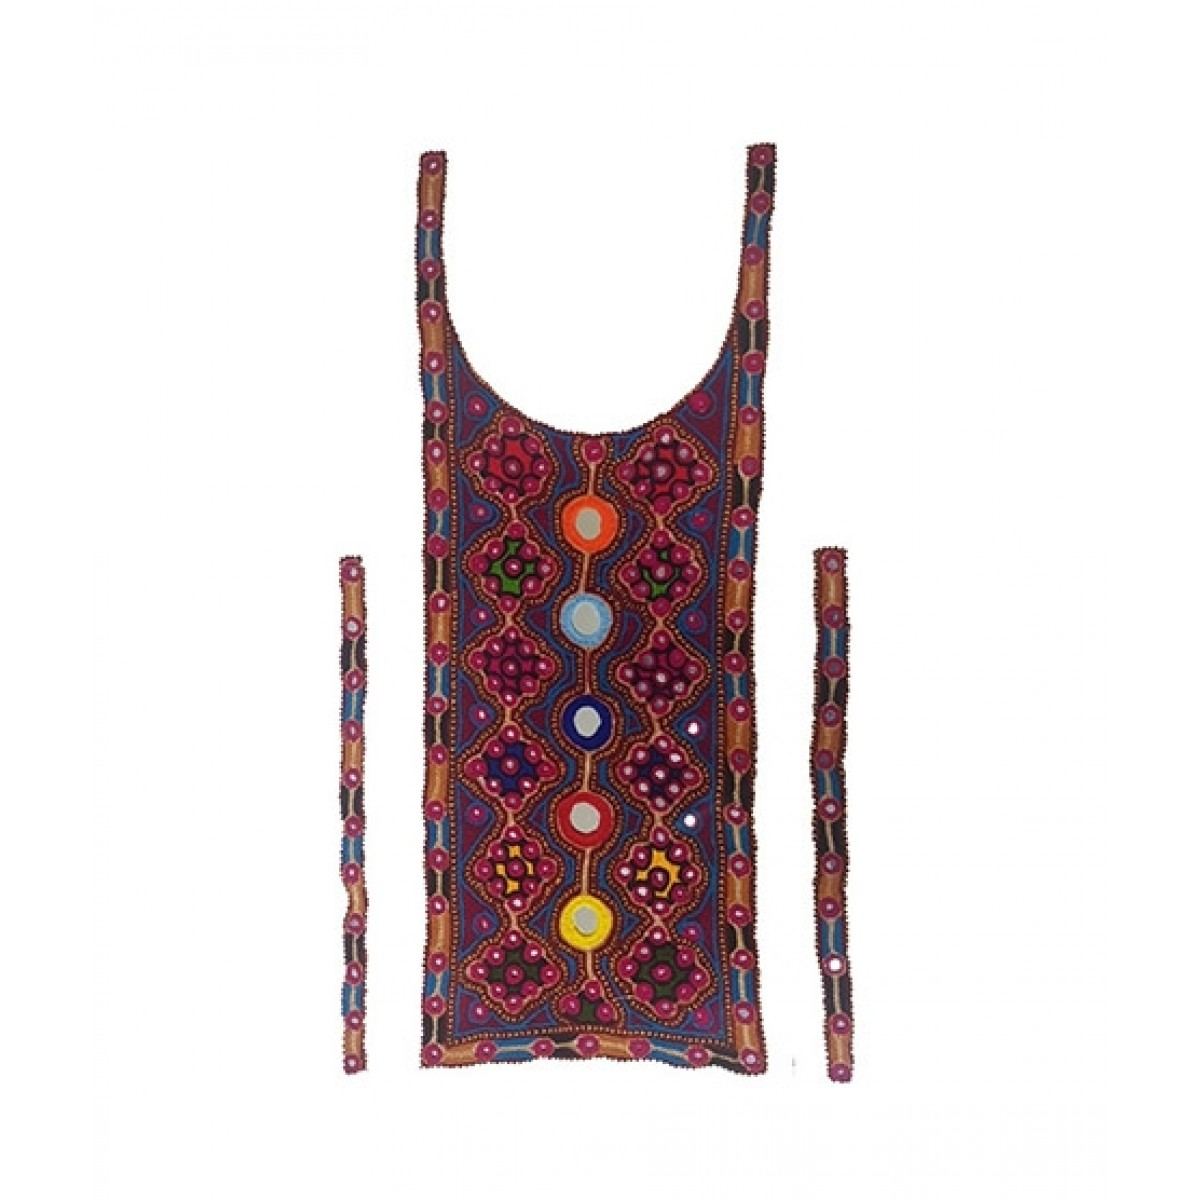 Proxymedia Sindhi Embroider Neck (Gala) - Design 5